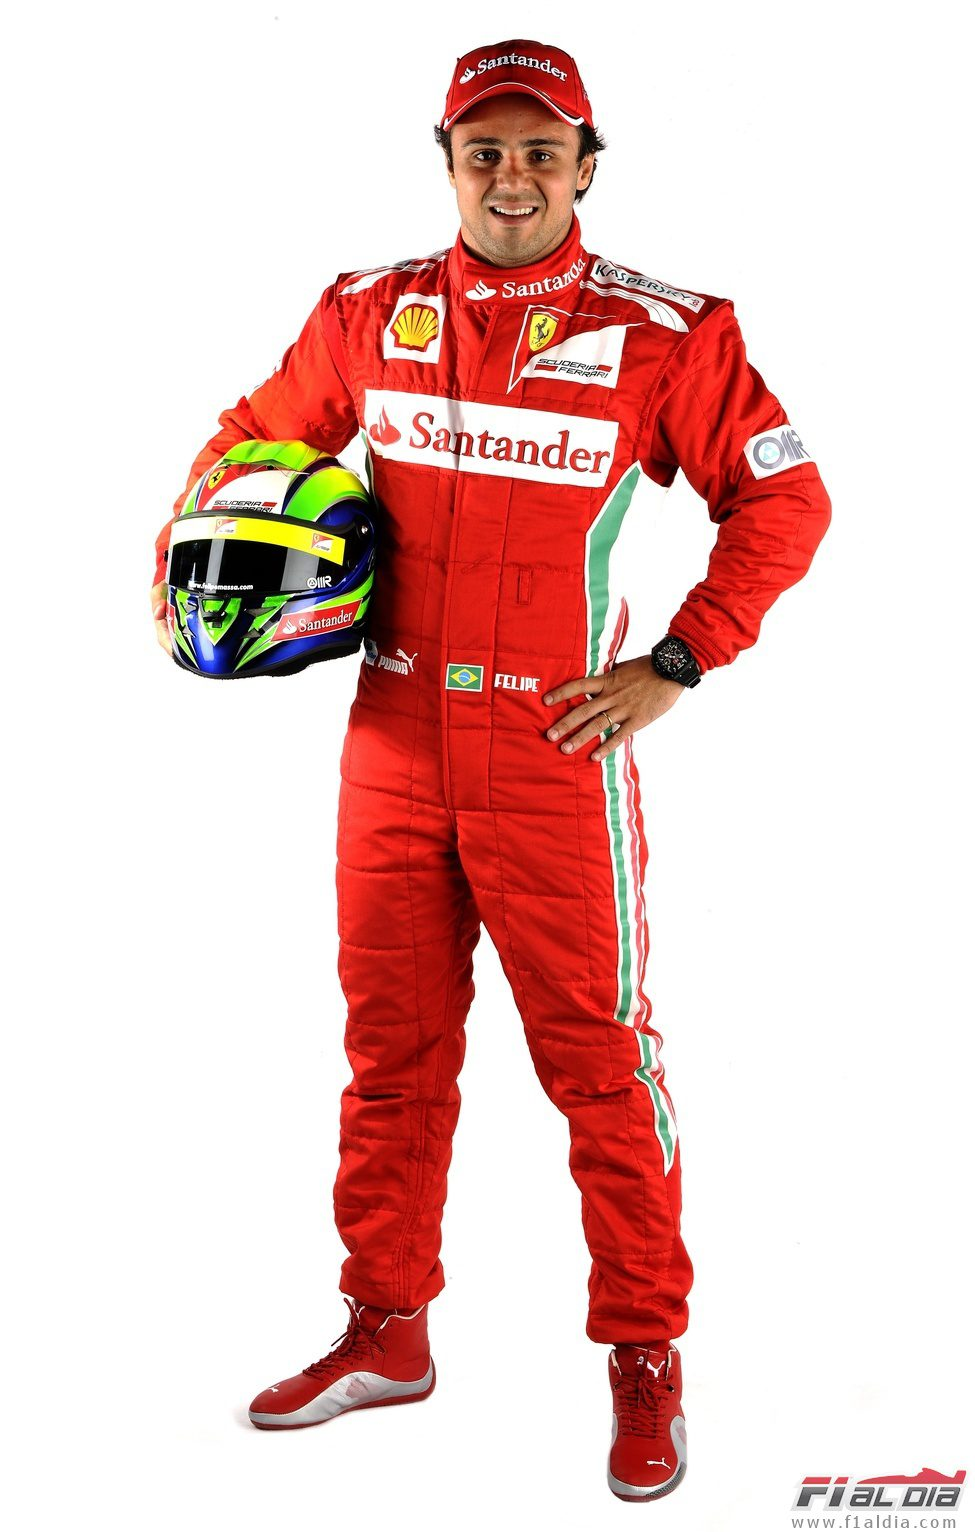 Presentación equipos F1 2012 11805_felipe-massa-piloto-de-ferrari-en-2012